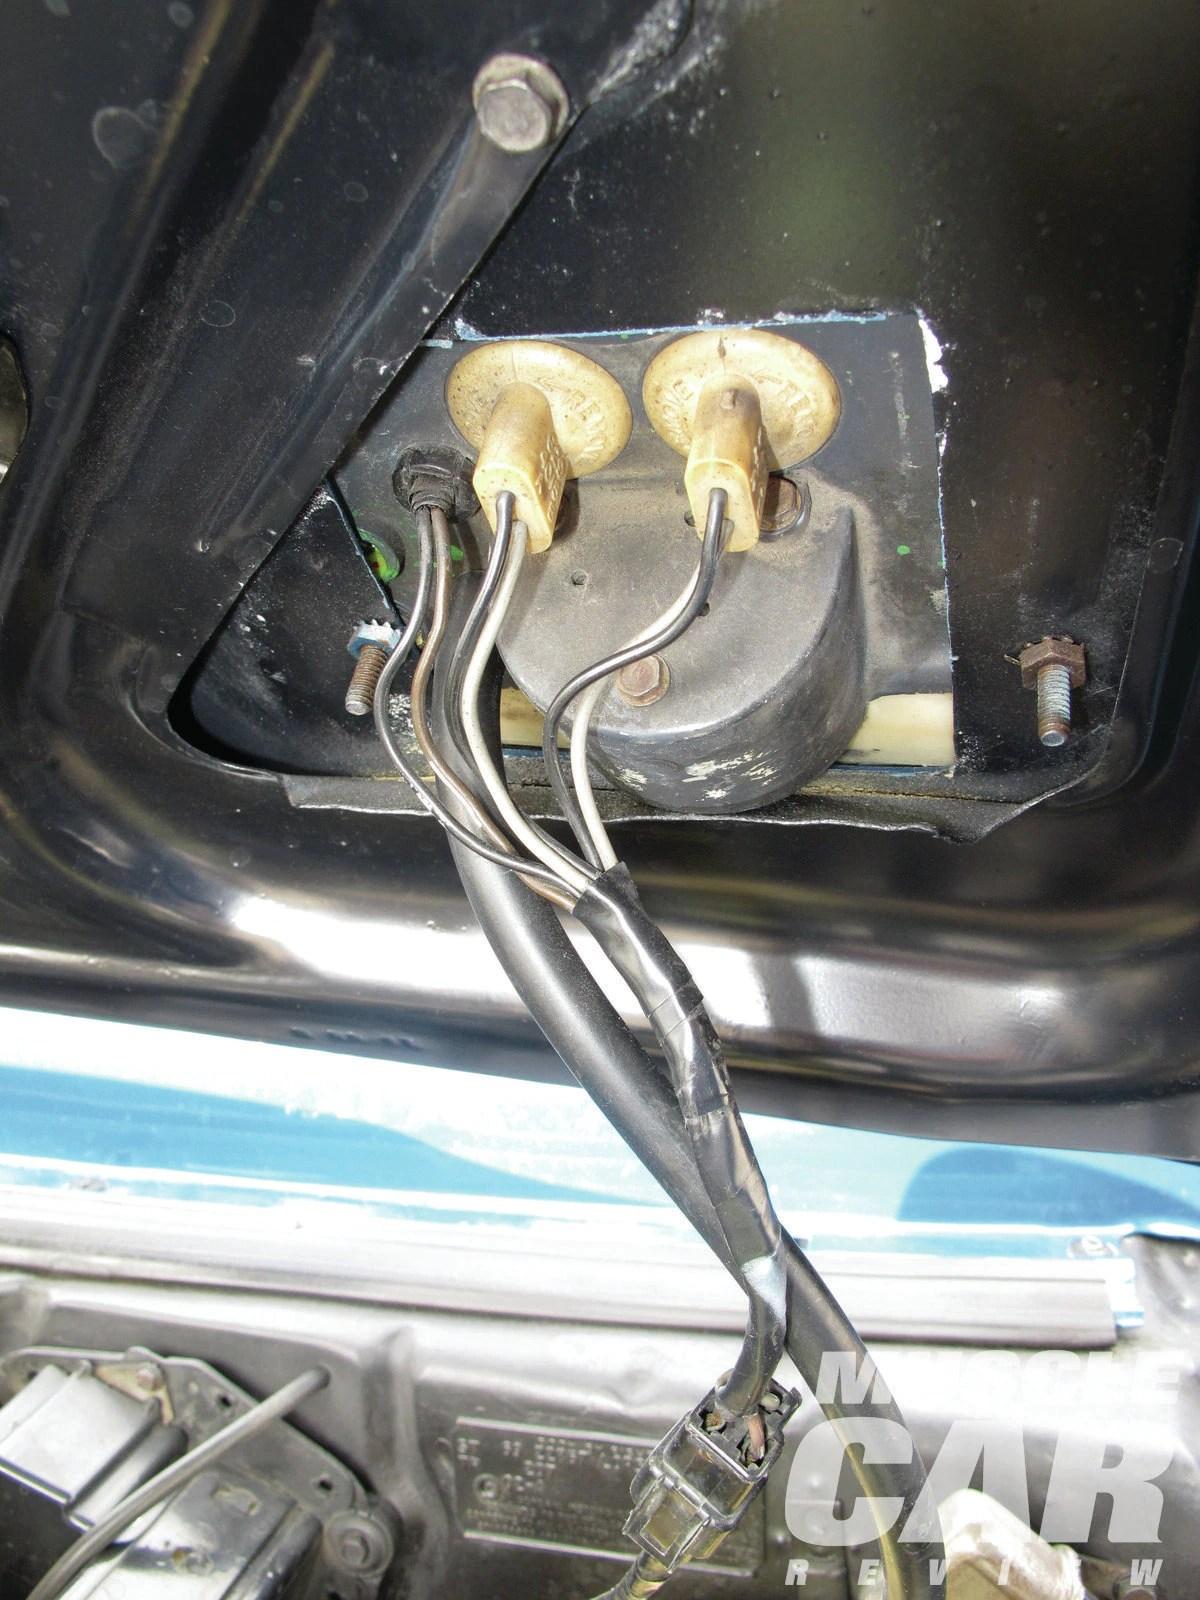 1968 pontiac gto hood tach wiring diagram electrical wiring diagrams rh wiringforall today 1967 pontiac le [ 1200 x 1600 Pixel ]